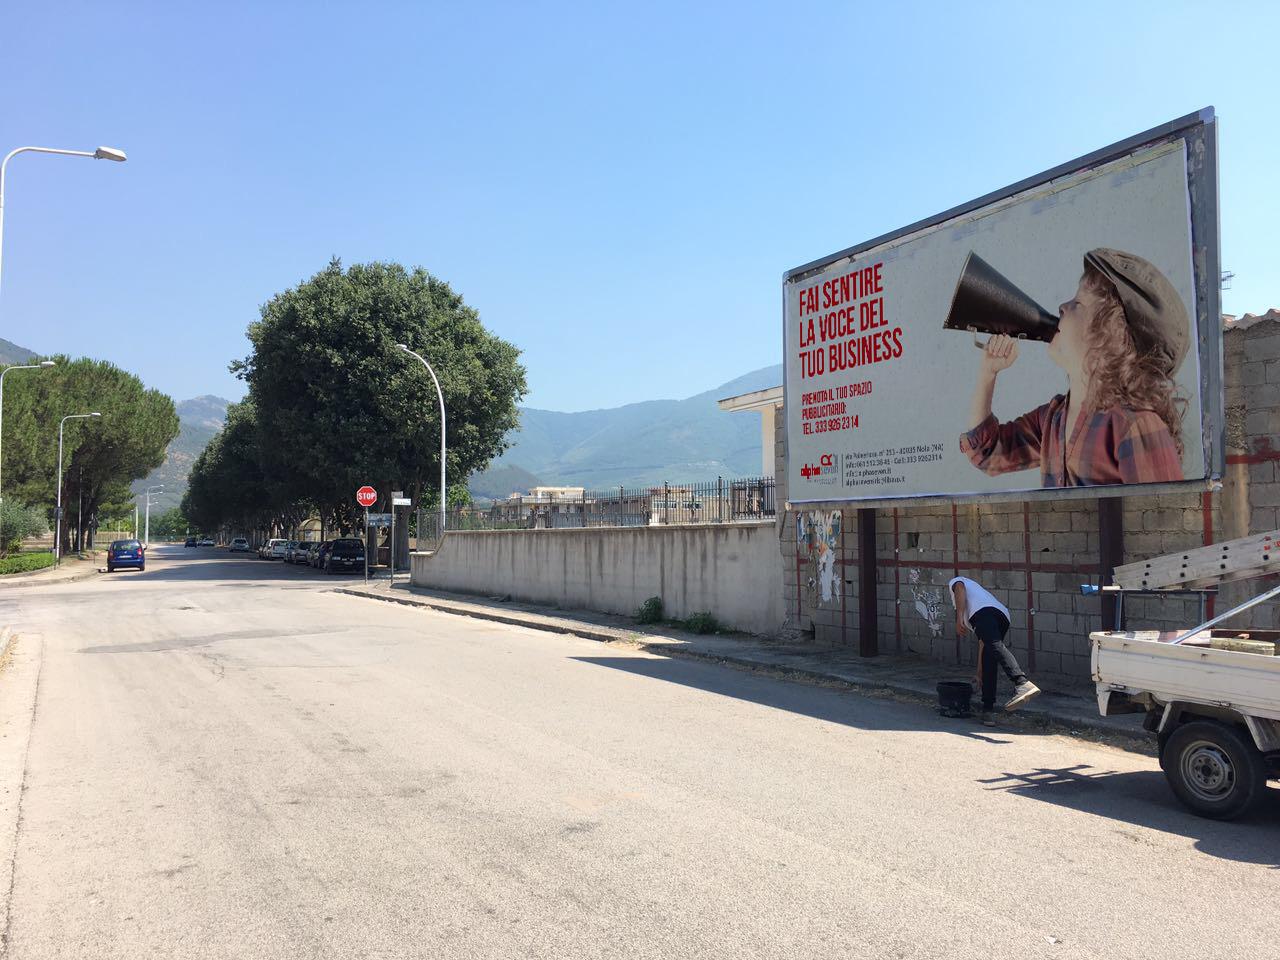 Impianto 6x3, Cicciano